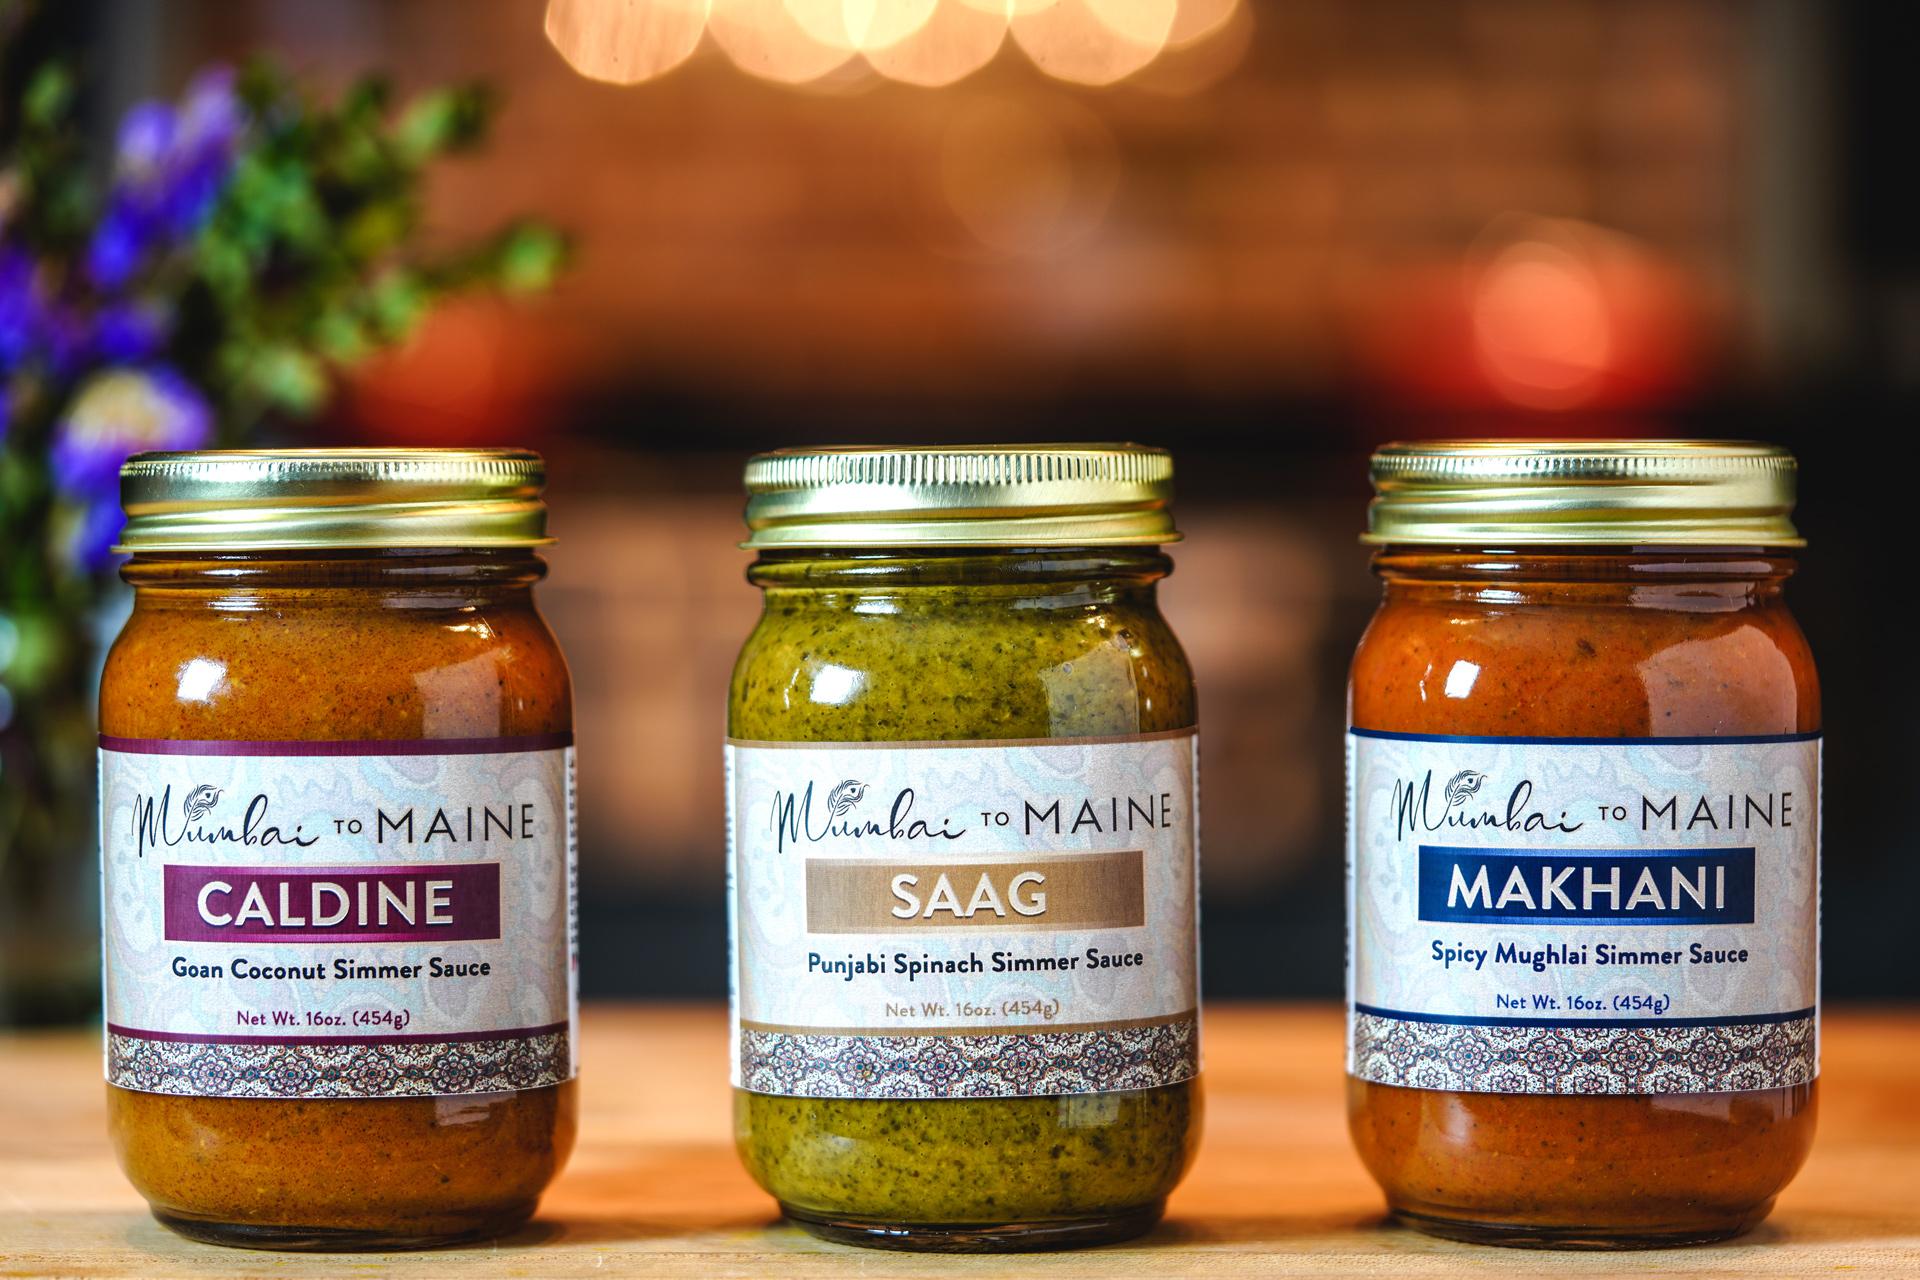 Mumbai to Maine Signature Simmer Sauces Variety Pack - Caldine, Makhani and Saag